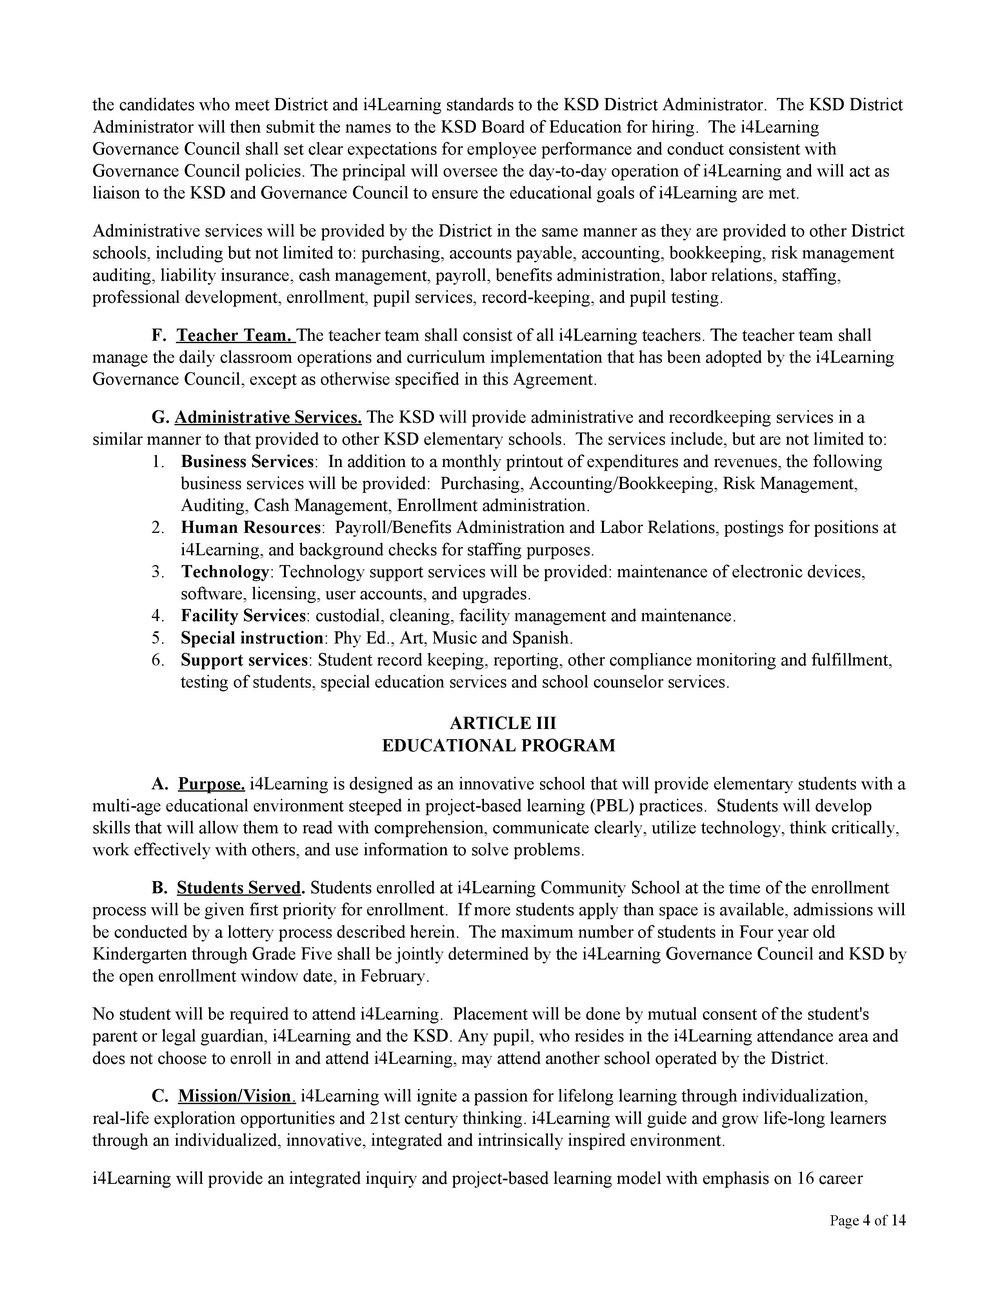 Contract pg 4.jpg